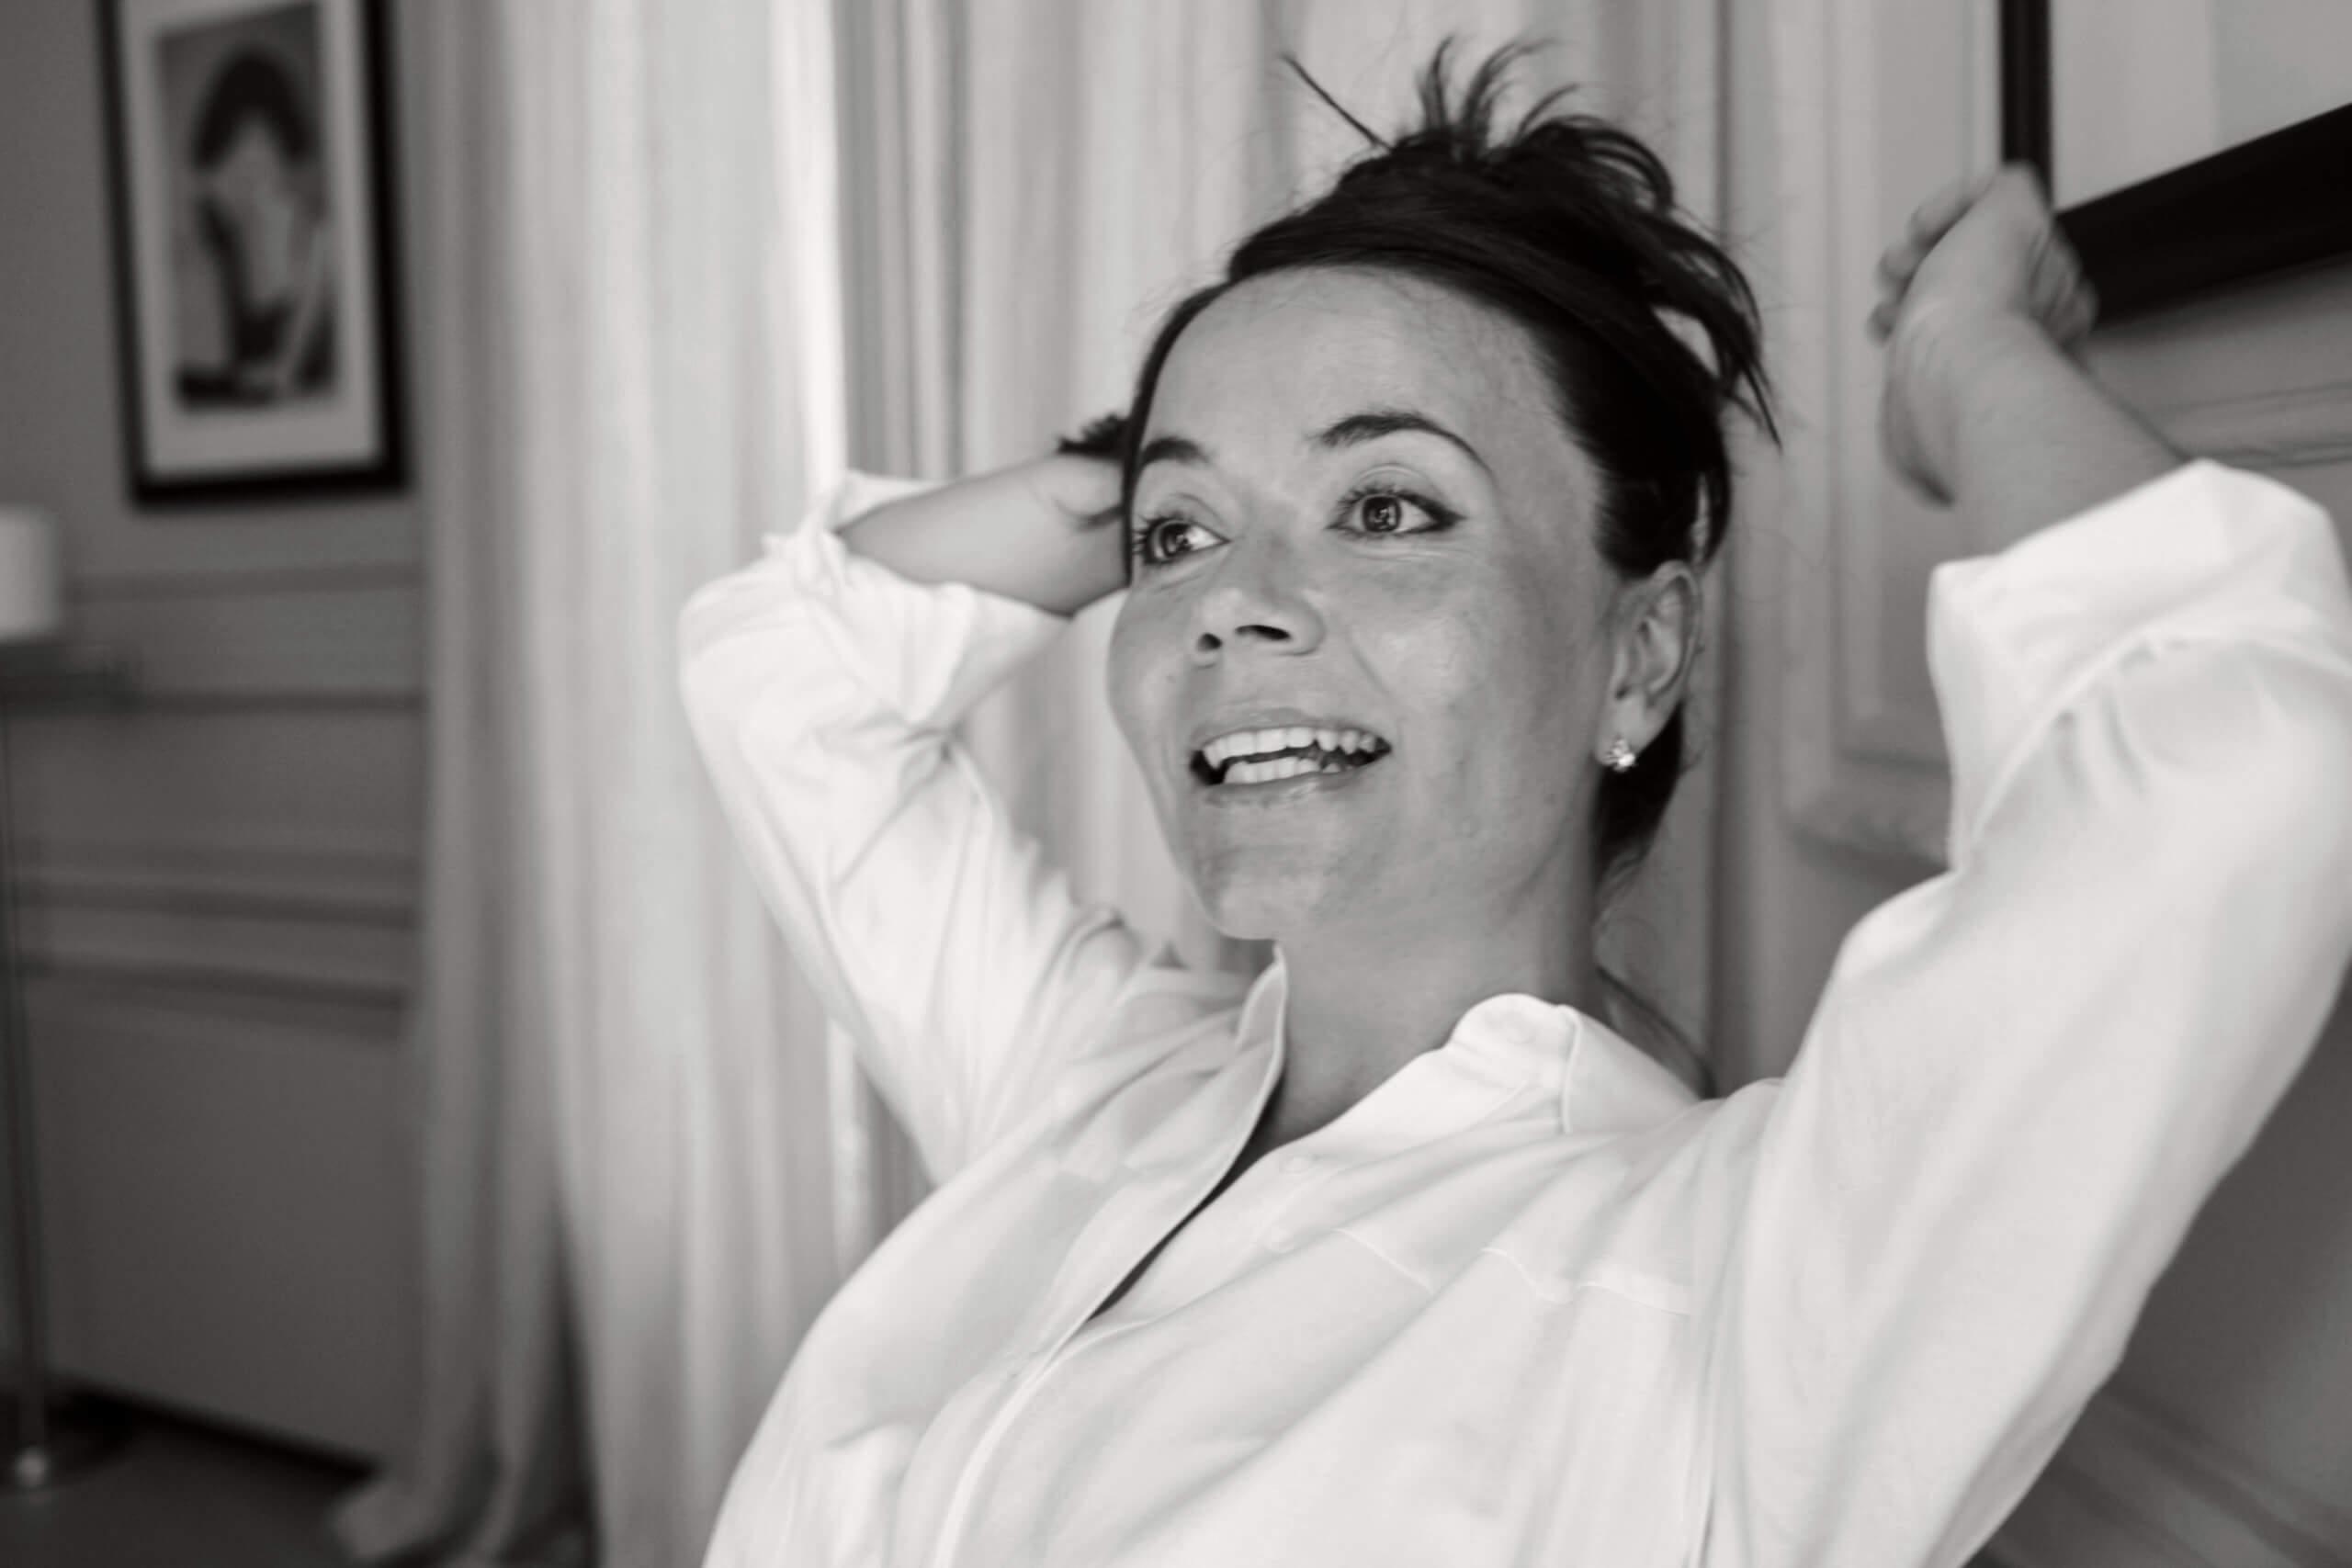 Pintora-Artistica-Carol-Moreno-fotografo-Cesar-Lucadamo-2